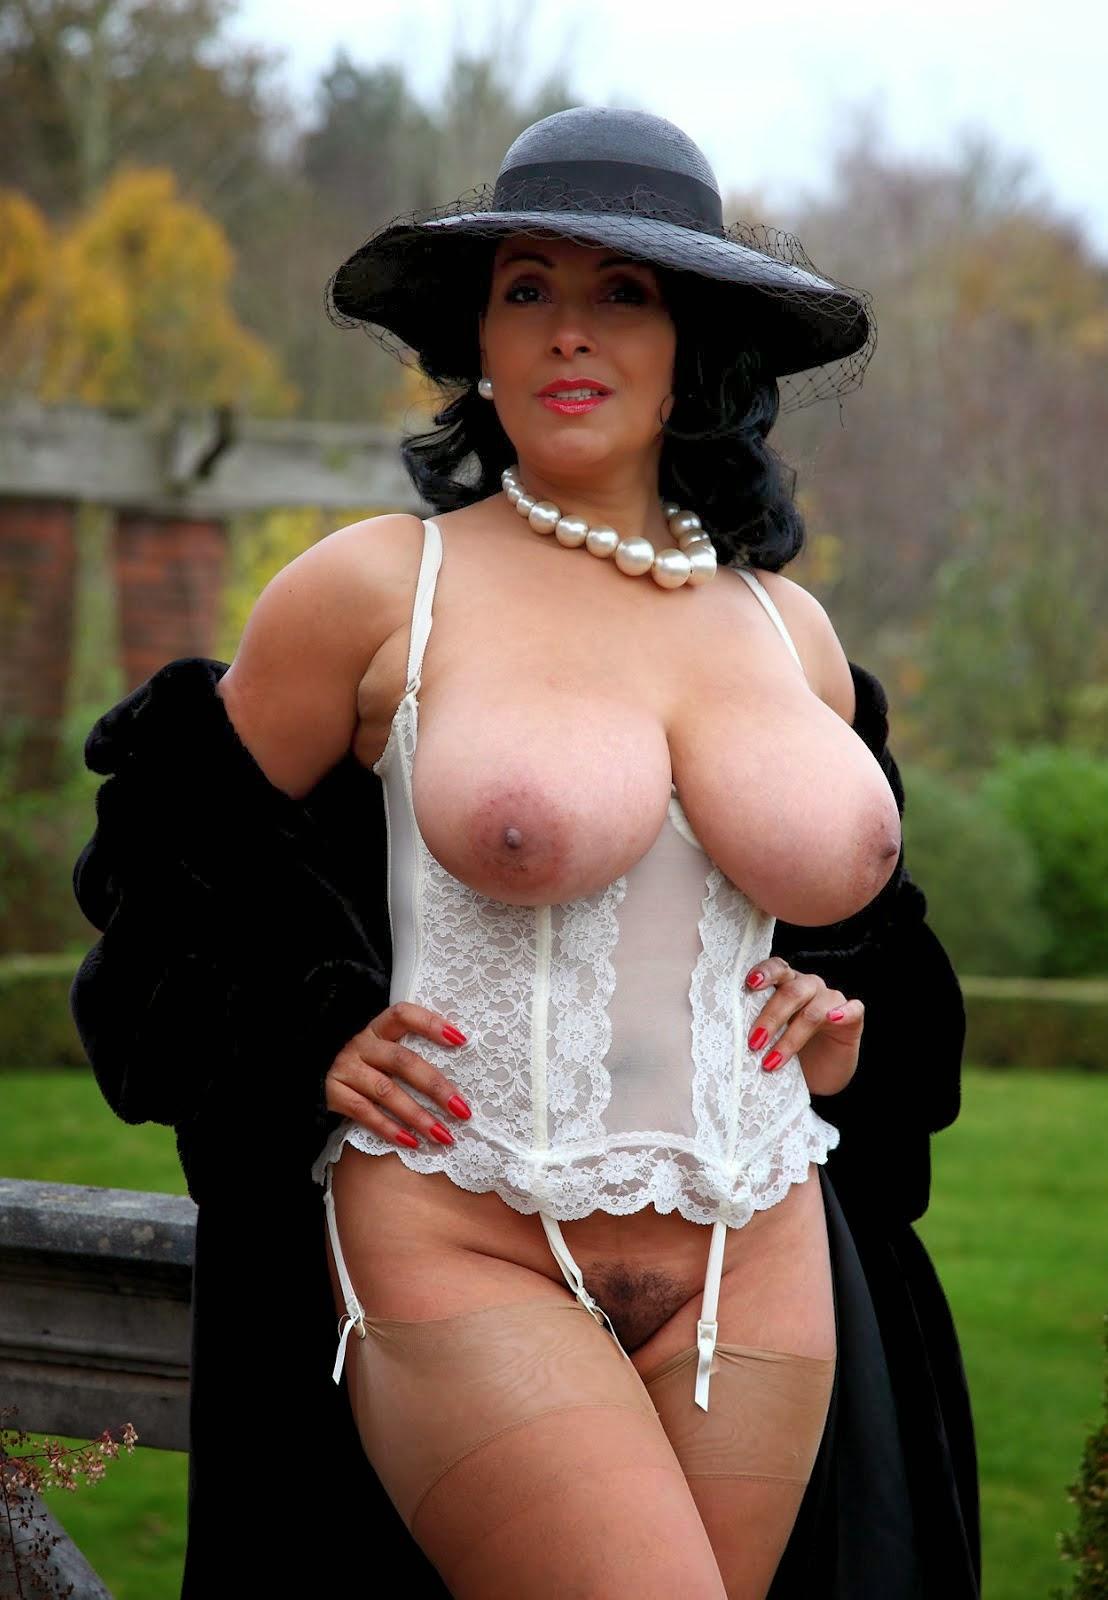 foto-erotika-pishnogrudih-madam